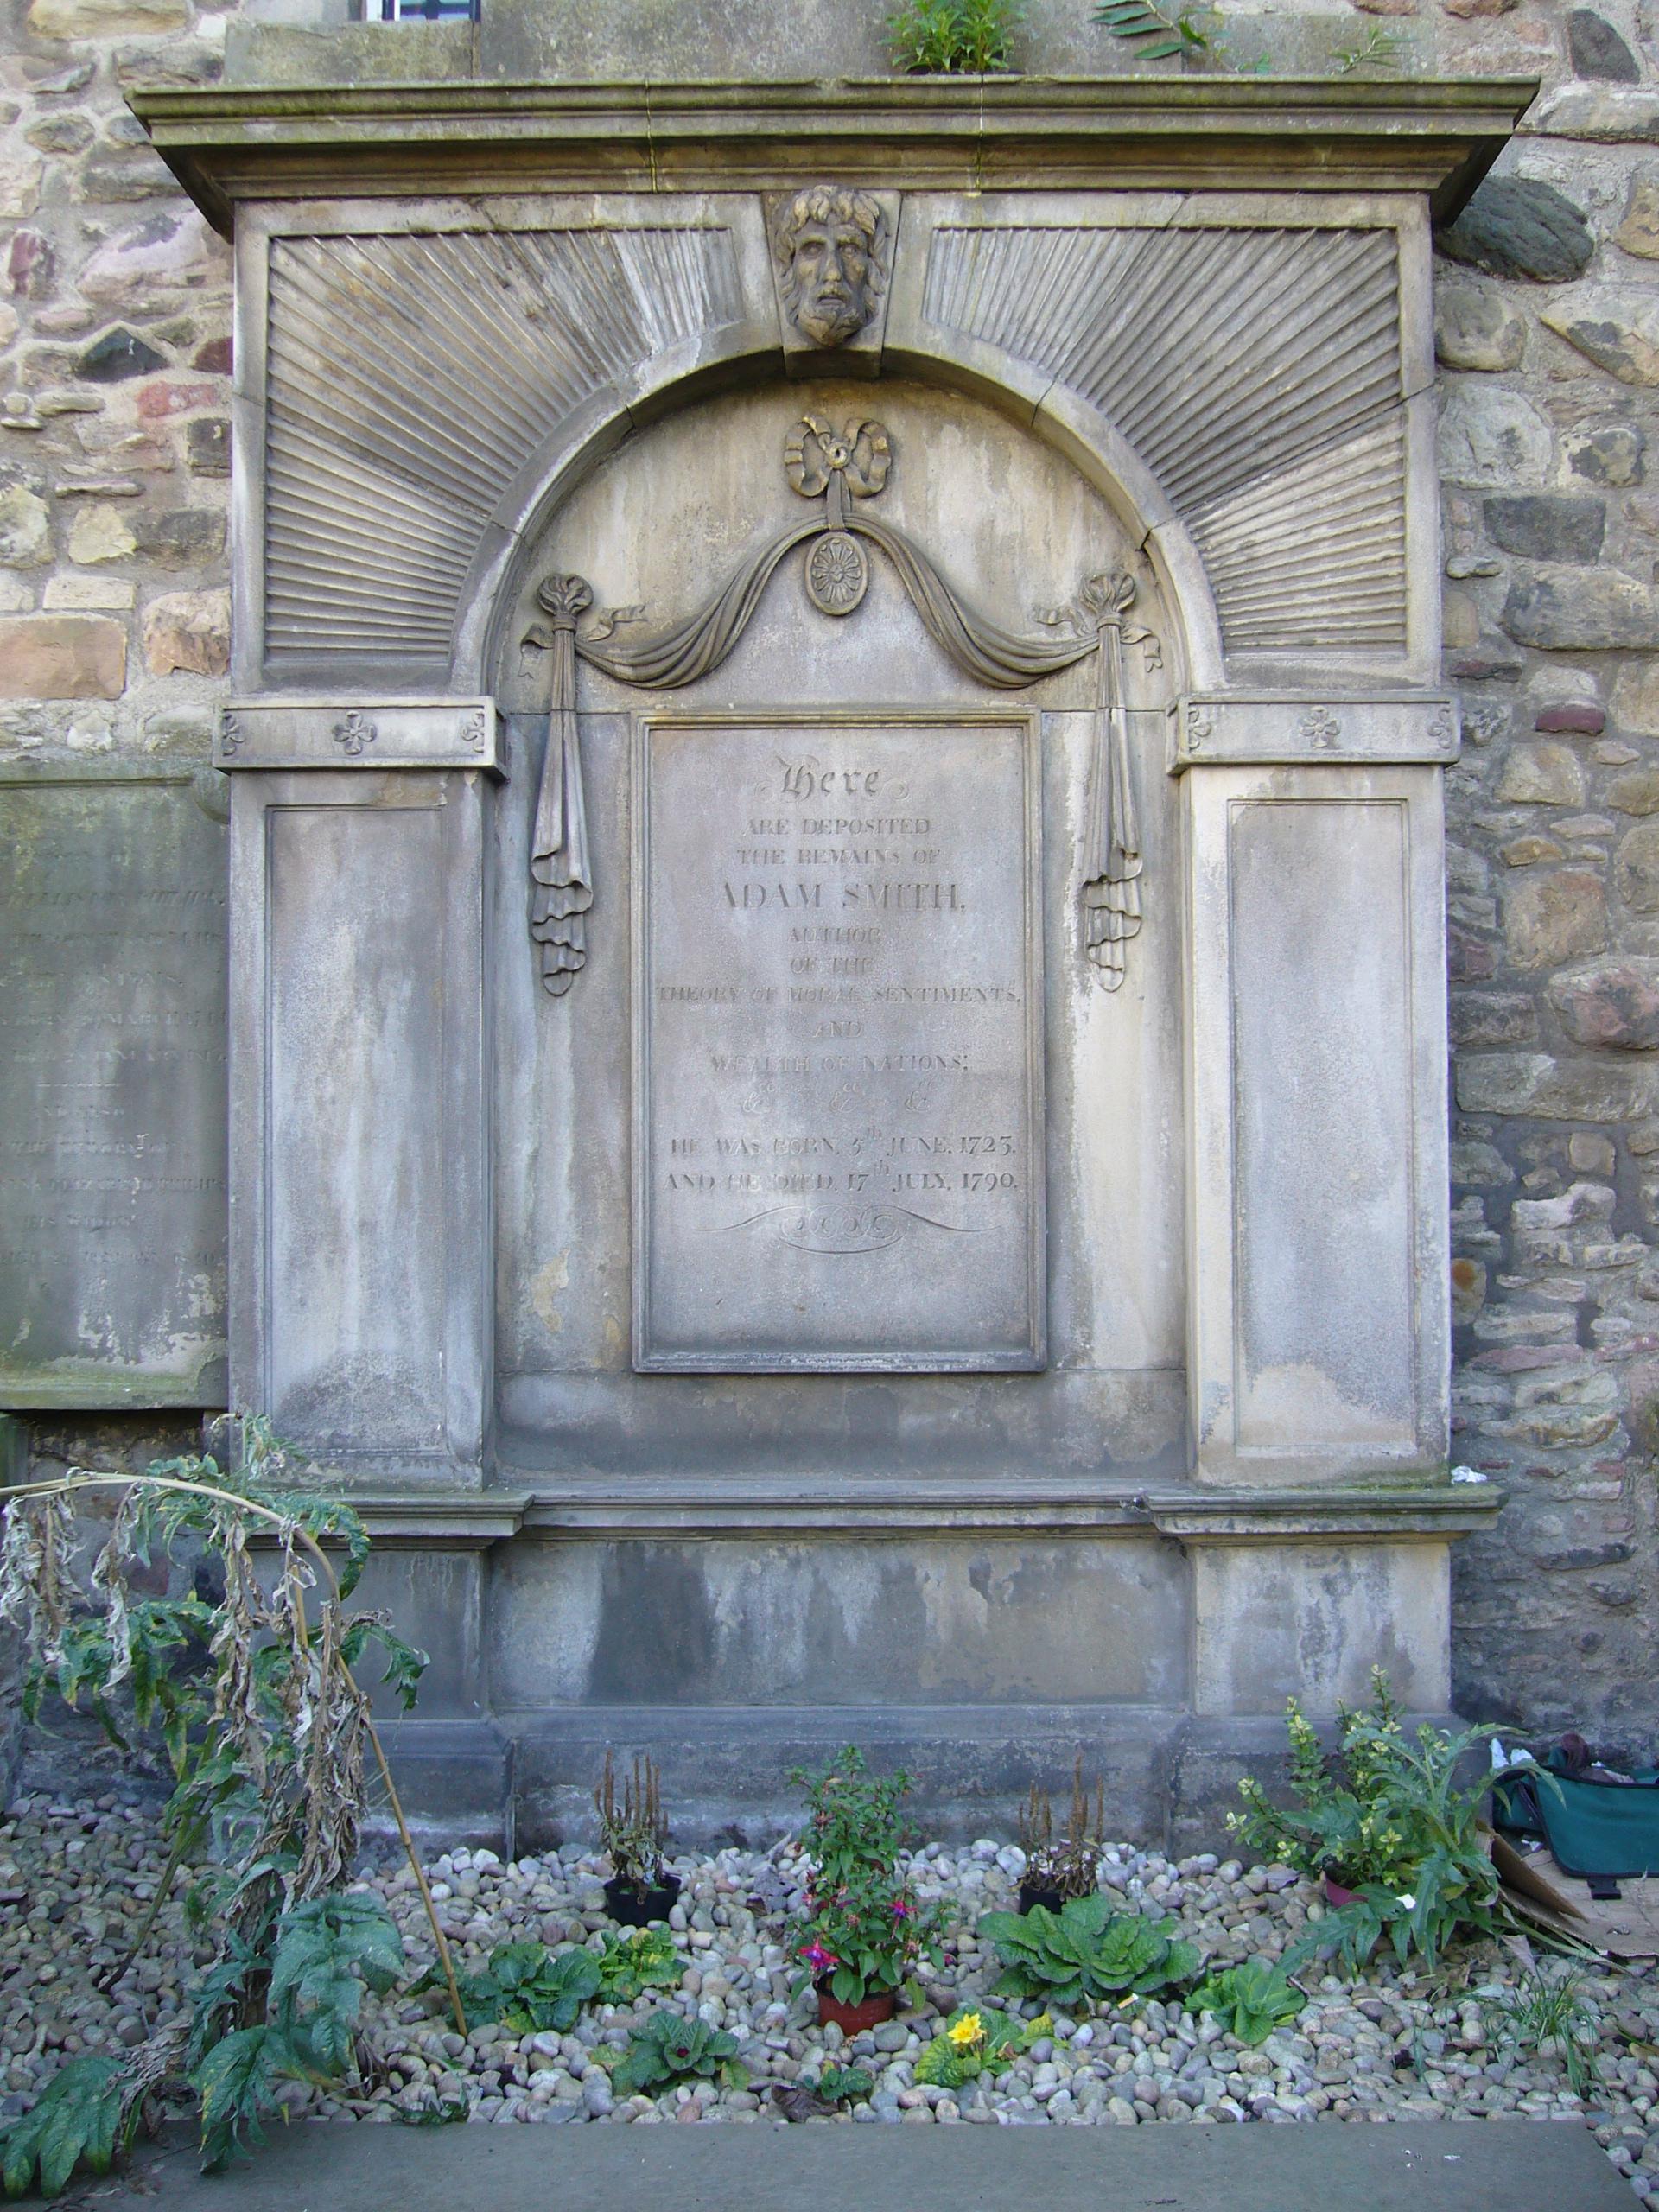 Adam Smith (1723—1790)